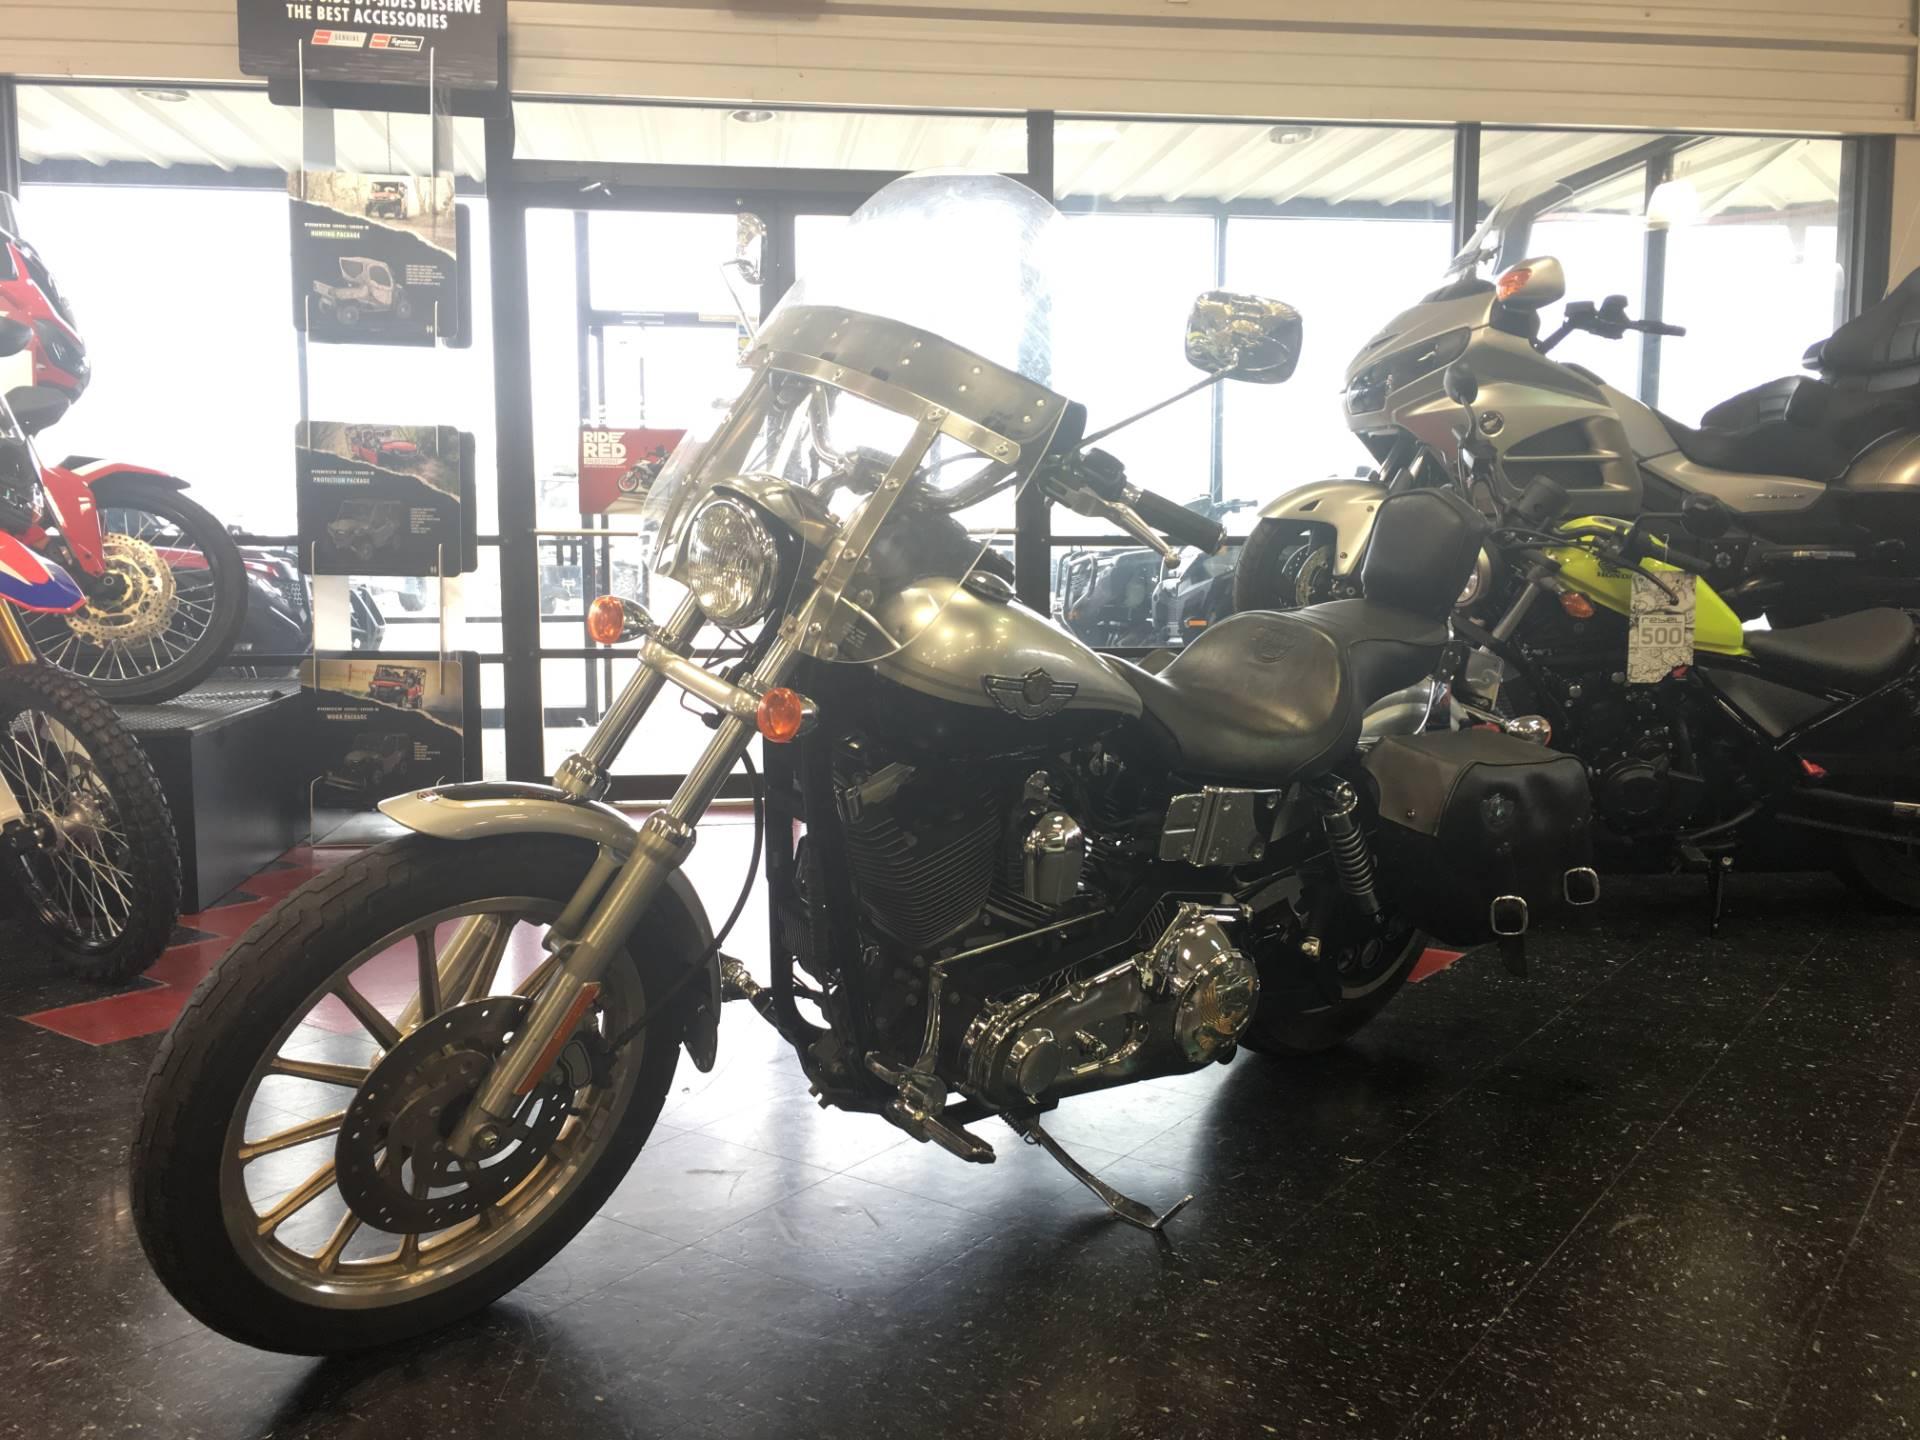 2003 Harley-Davidson FXDL Dyna Low Rider 4